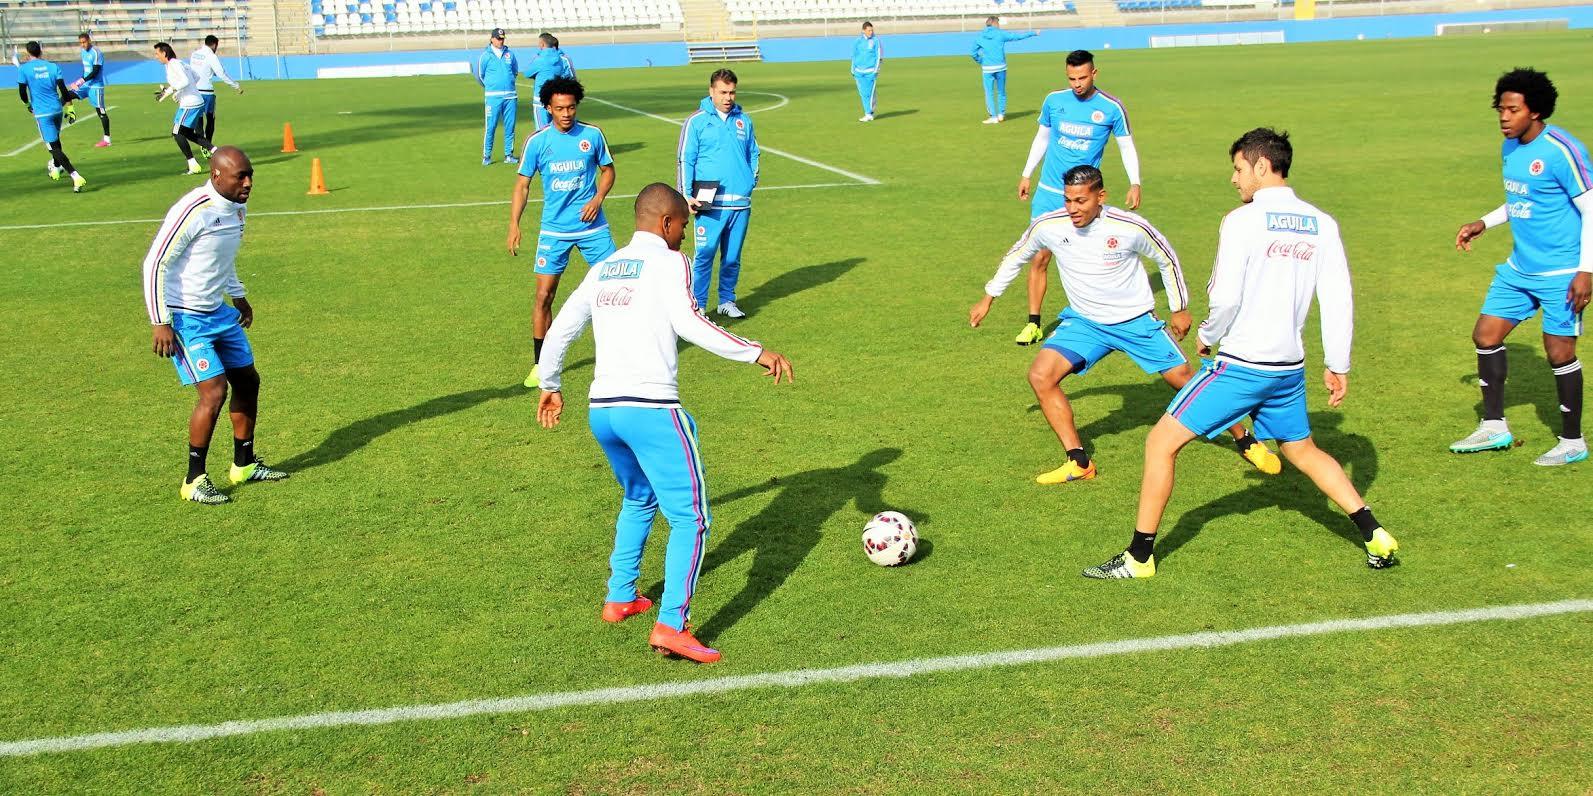 Listos para enfrentar a Argentina